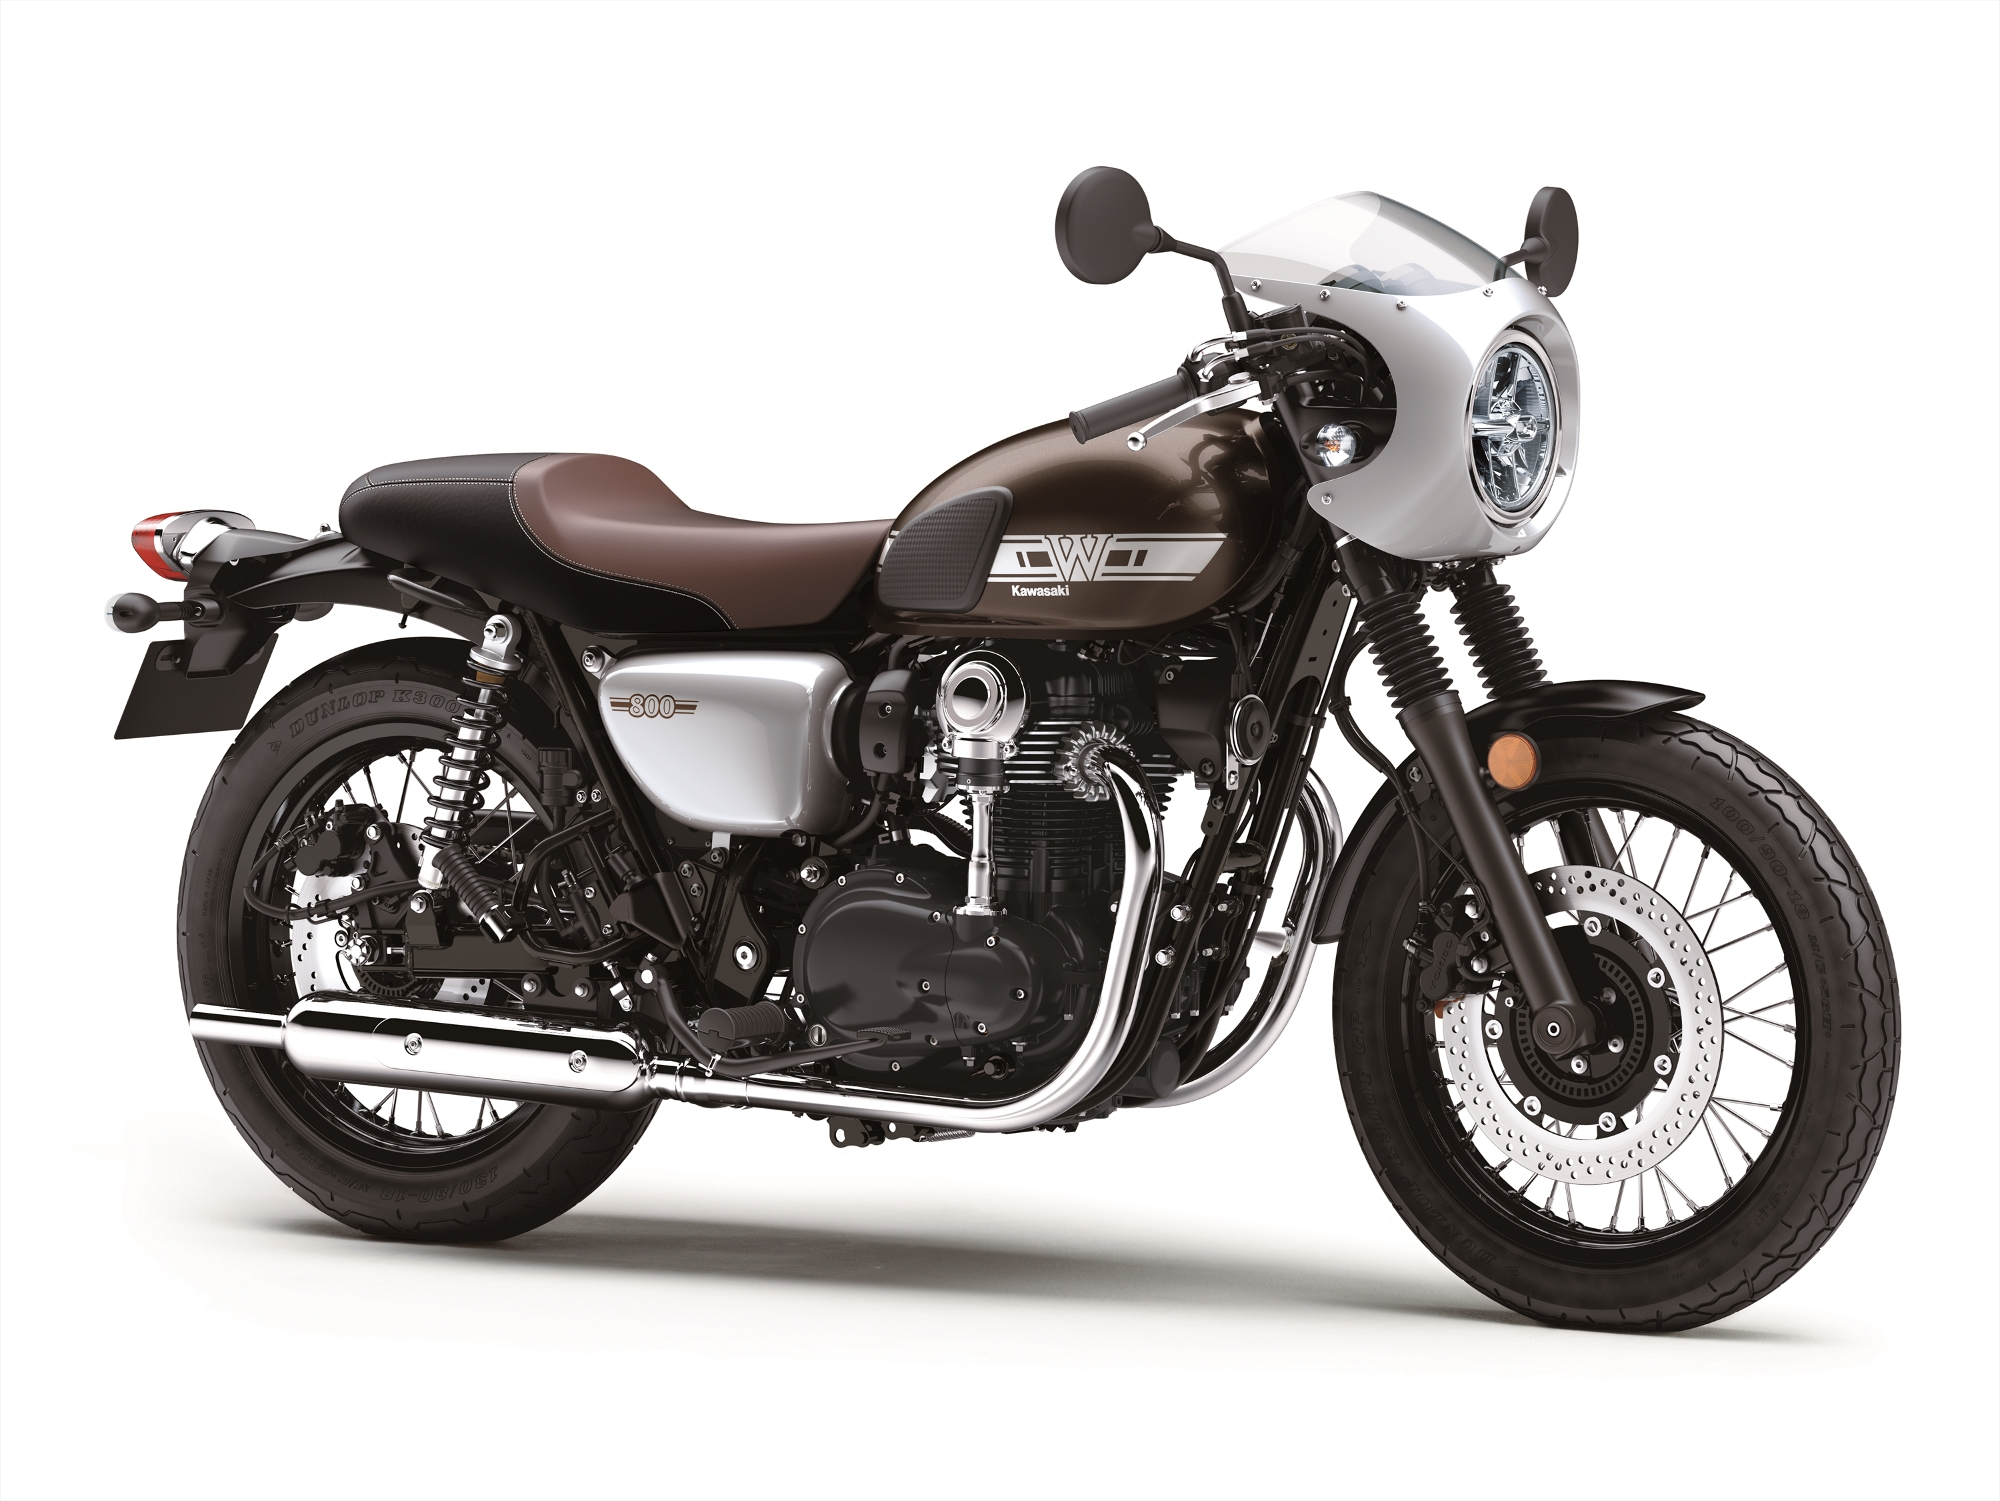 2019 Kawasaki W800 Cafe: Another Delightfully Retro Standard from Kawasaki - The Drive